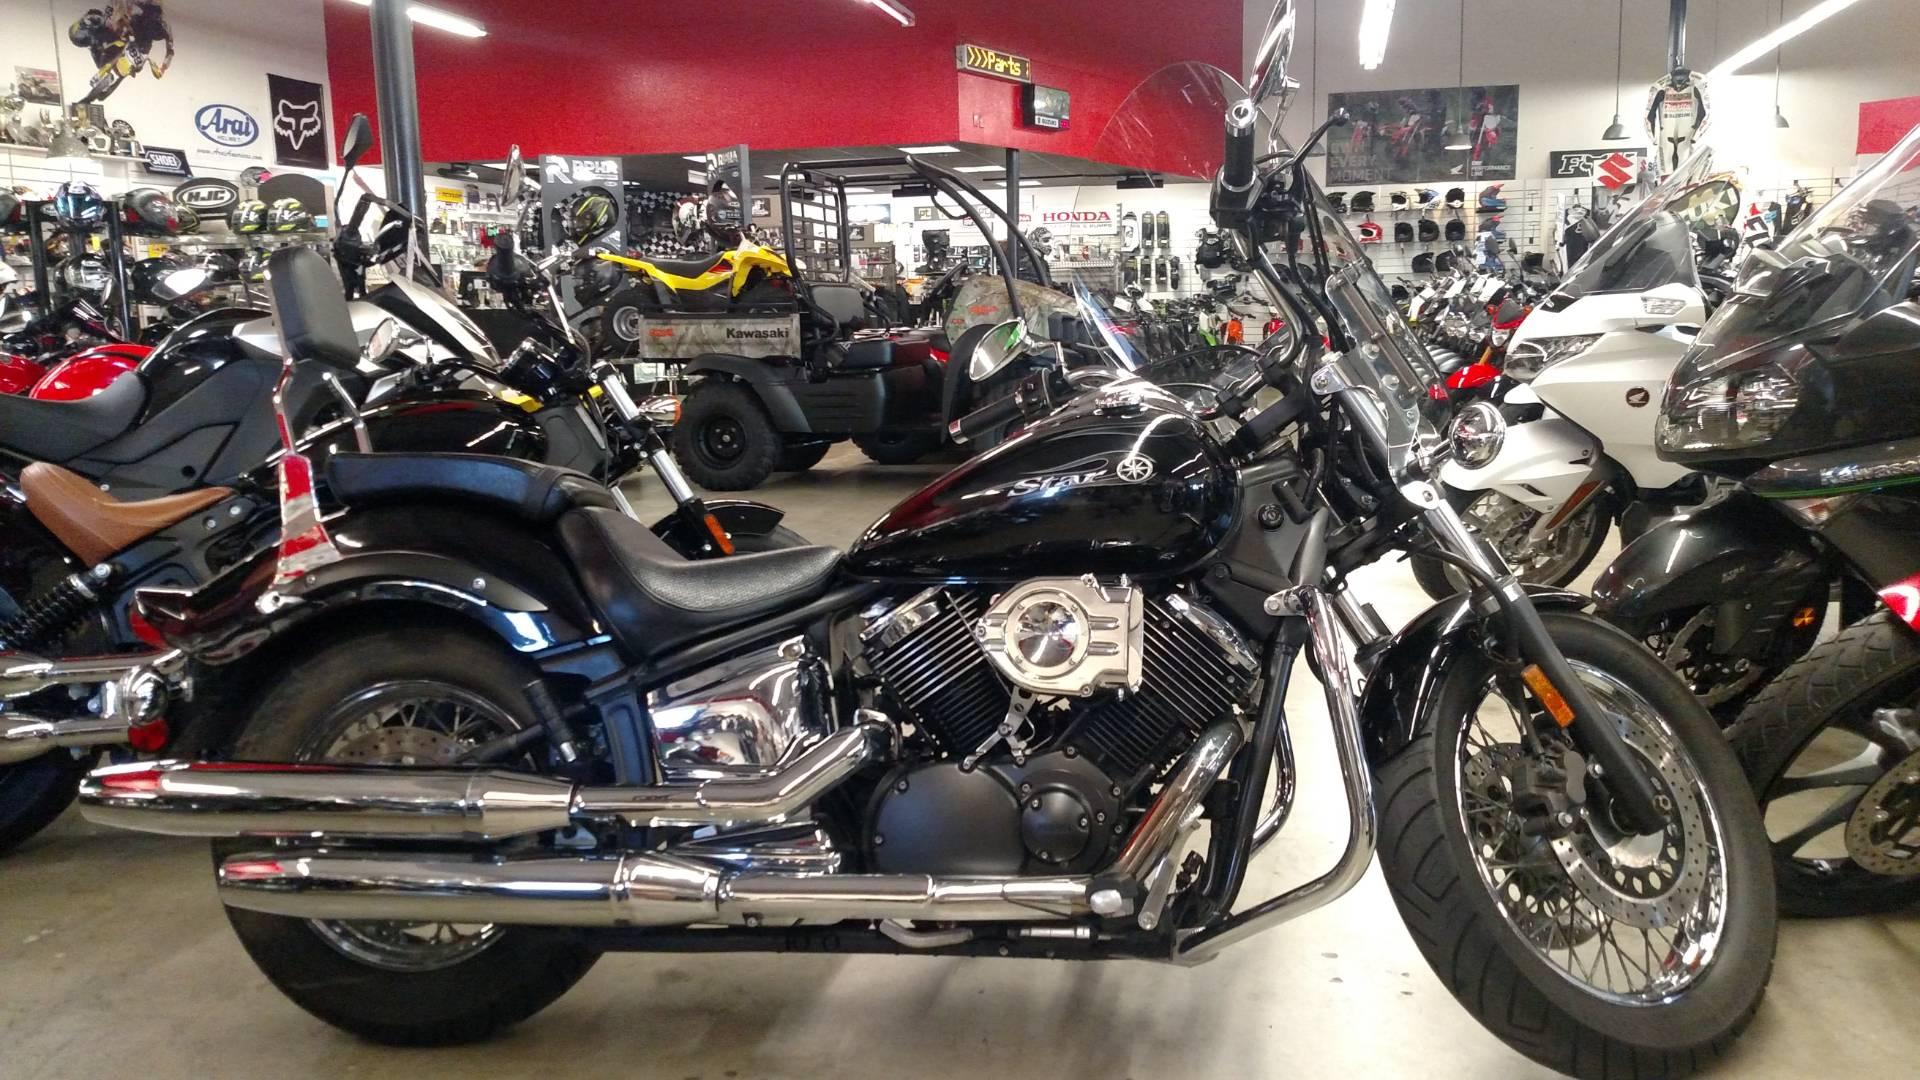 2008 Yamaha V Star 1100 Motorcycles Fremont California U09958